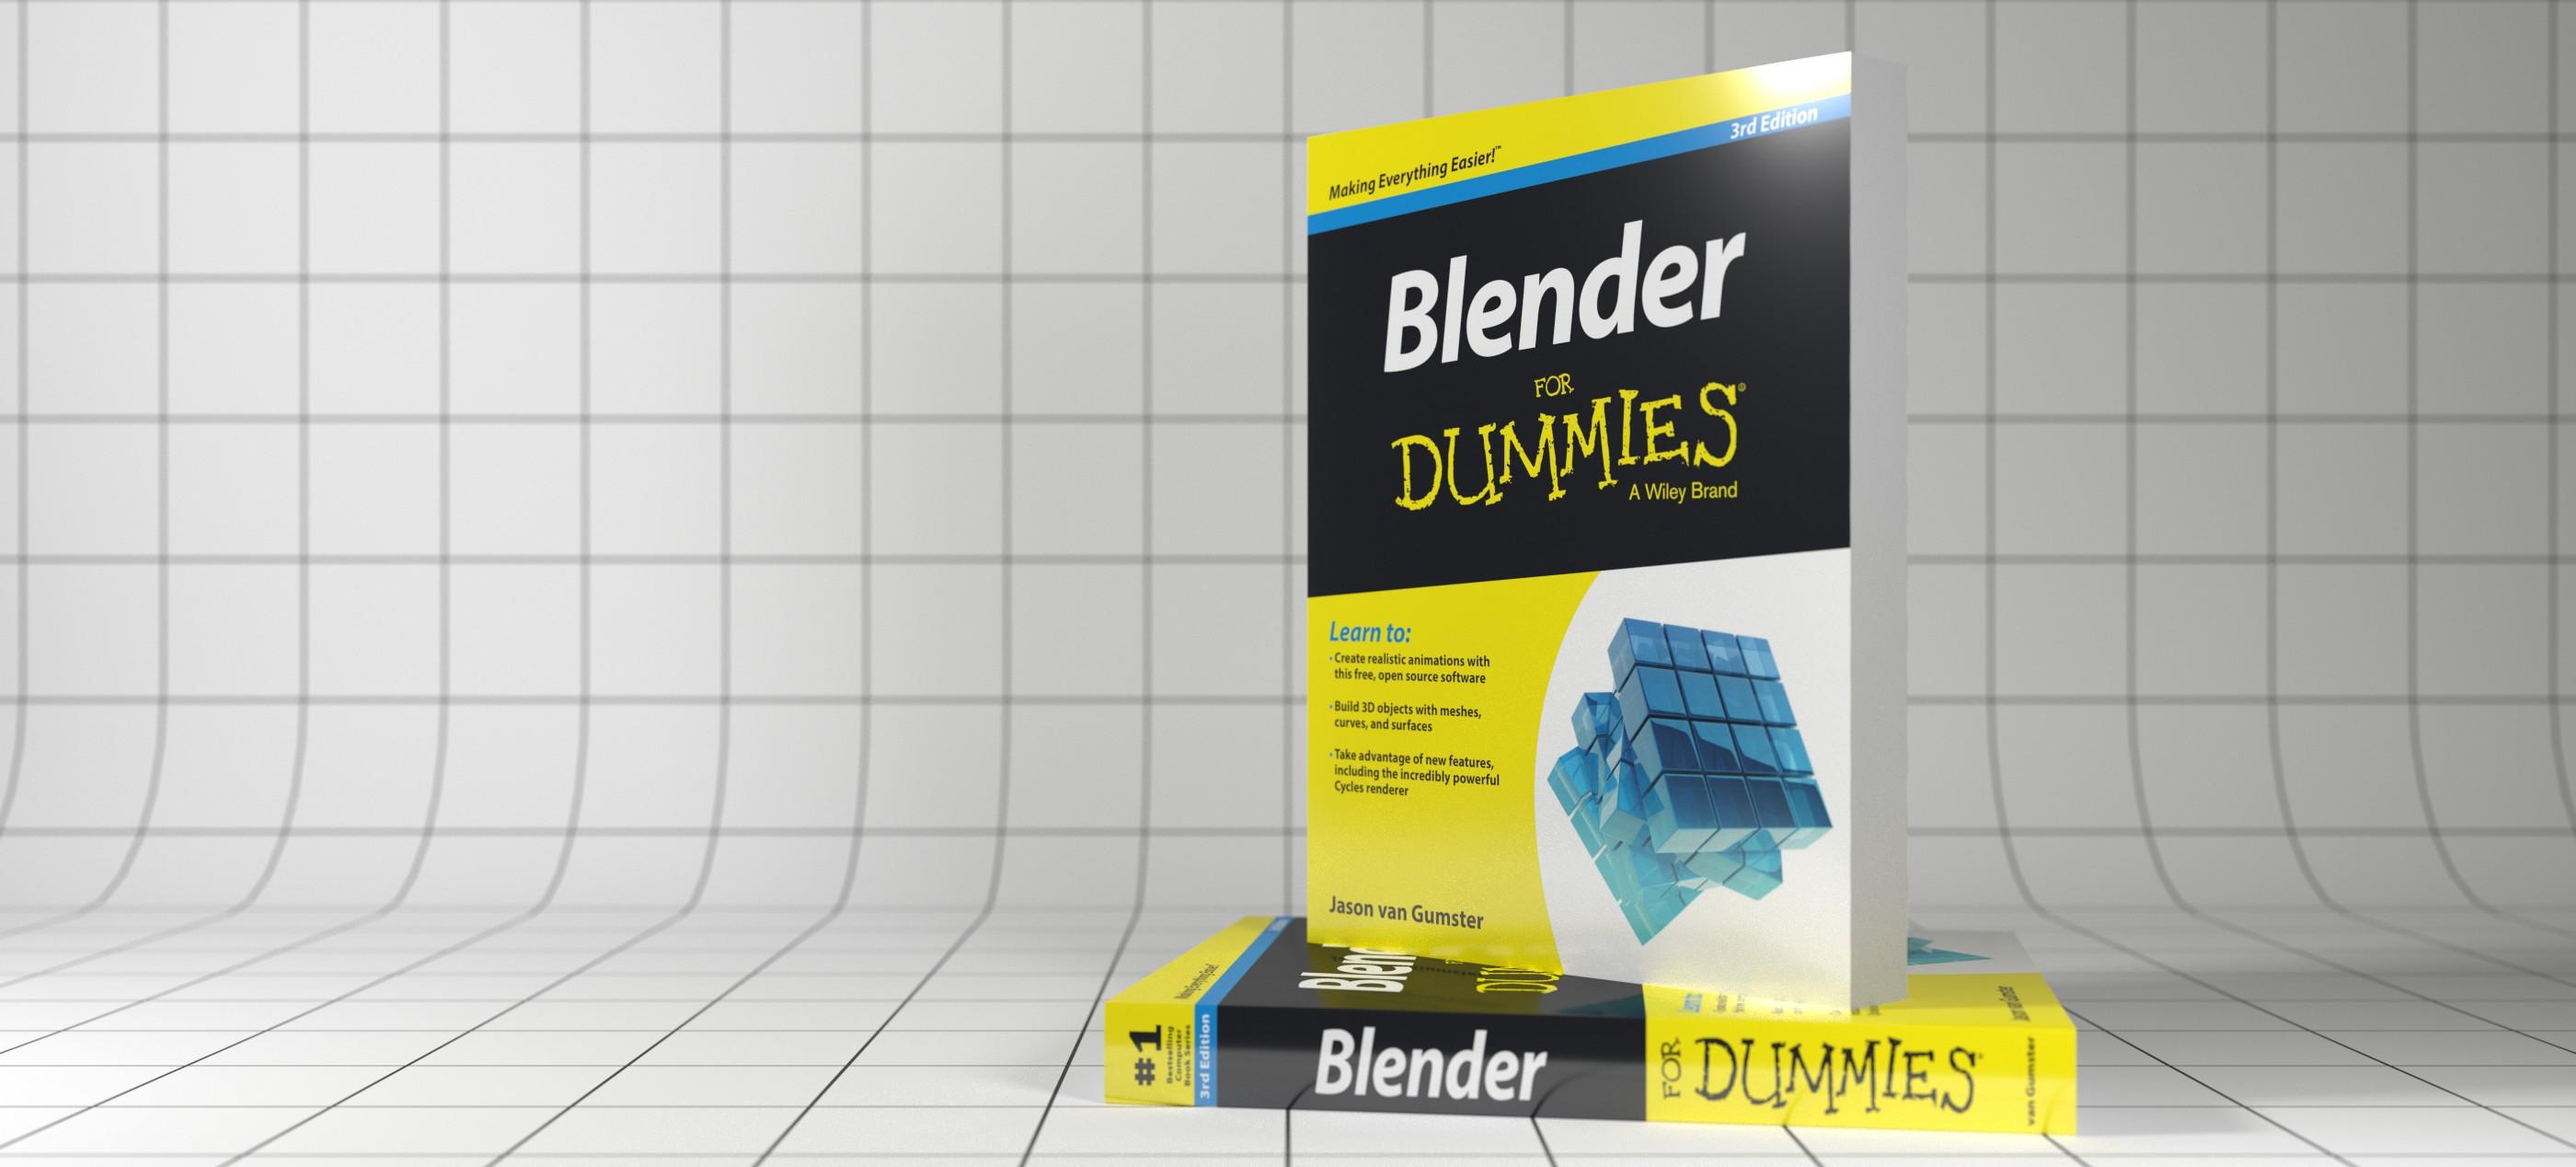 blender for dummies 3rd edition pdf